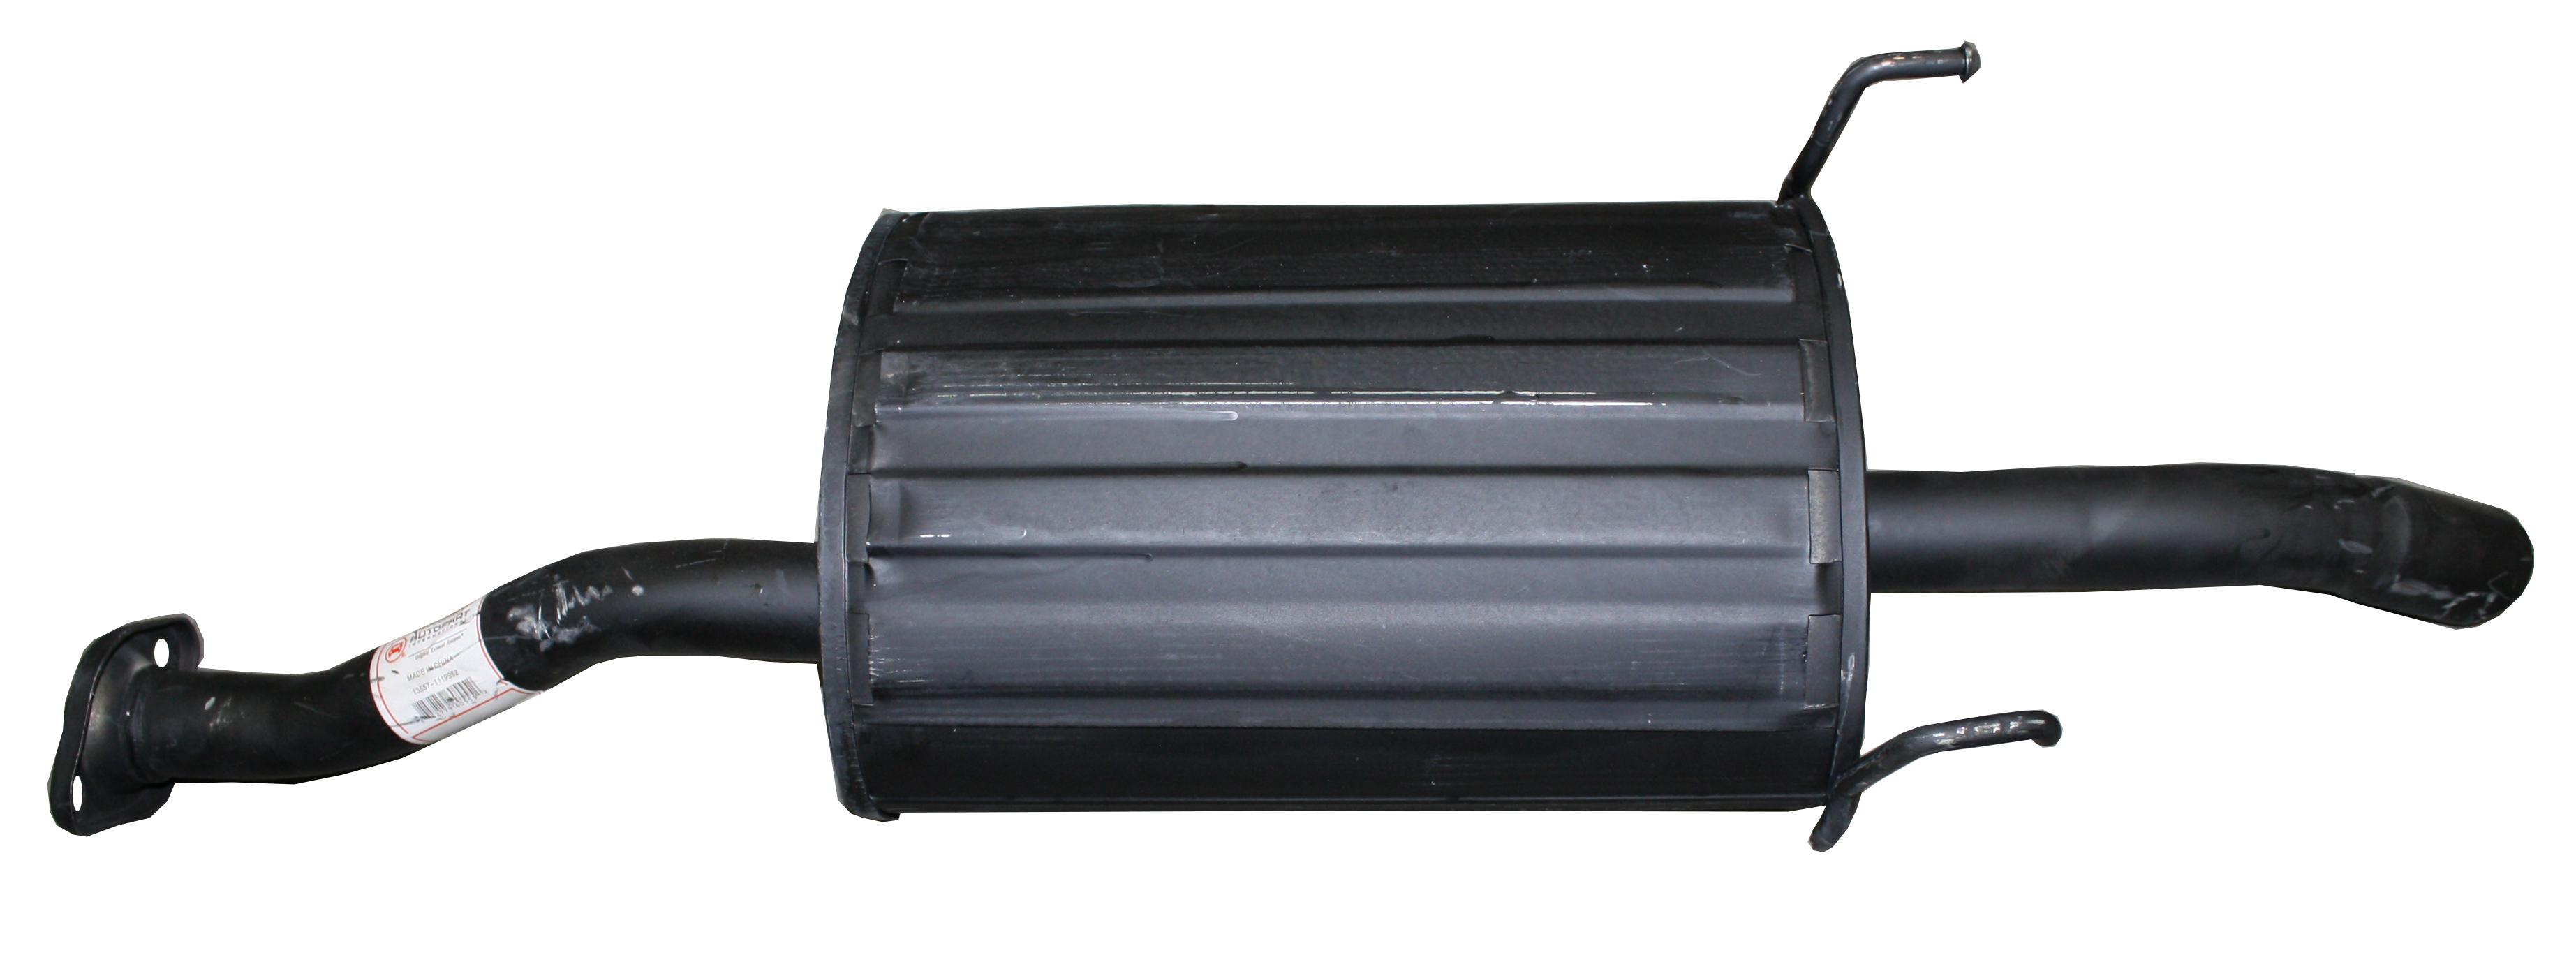 X-2103-60555